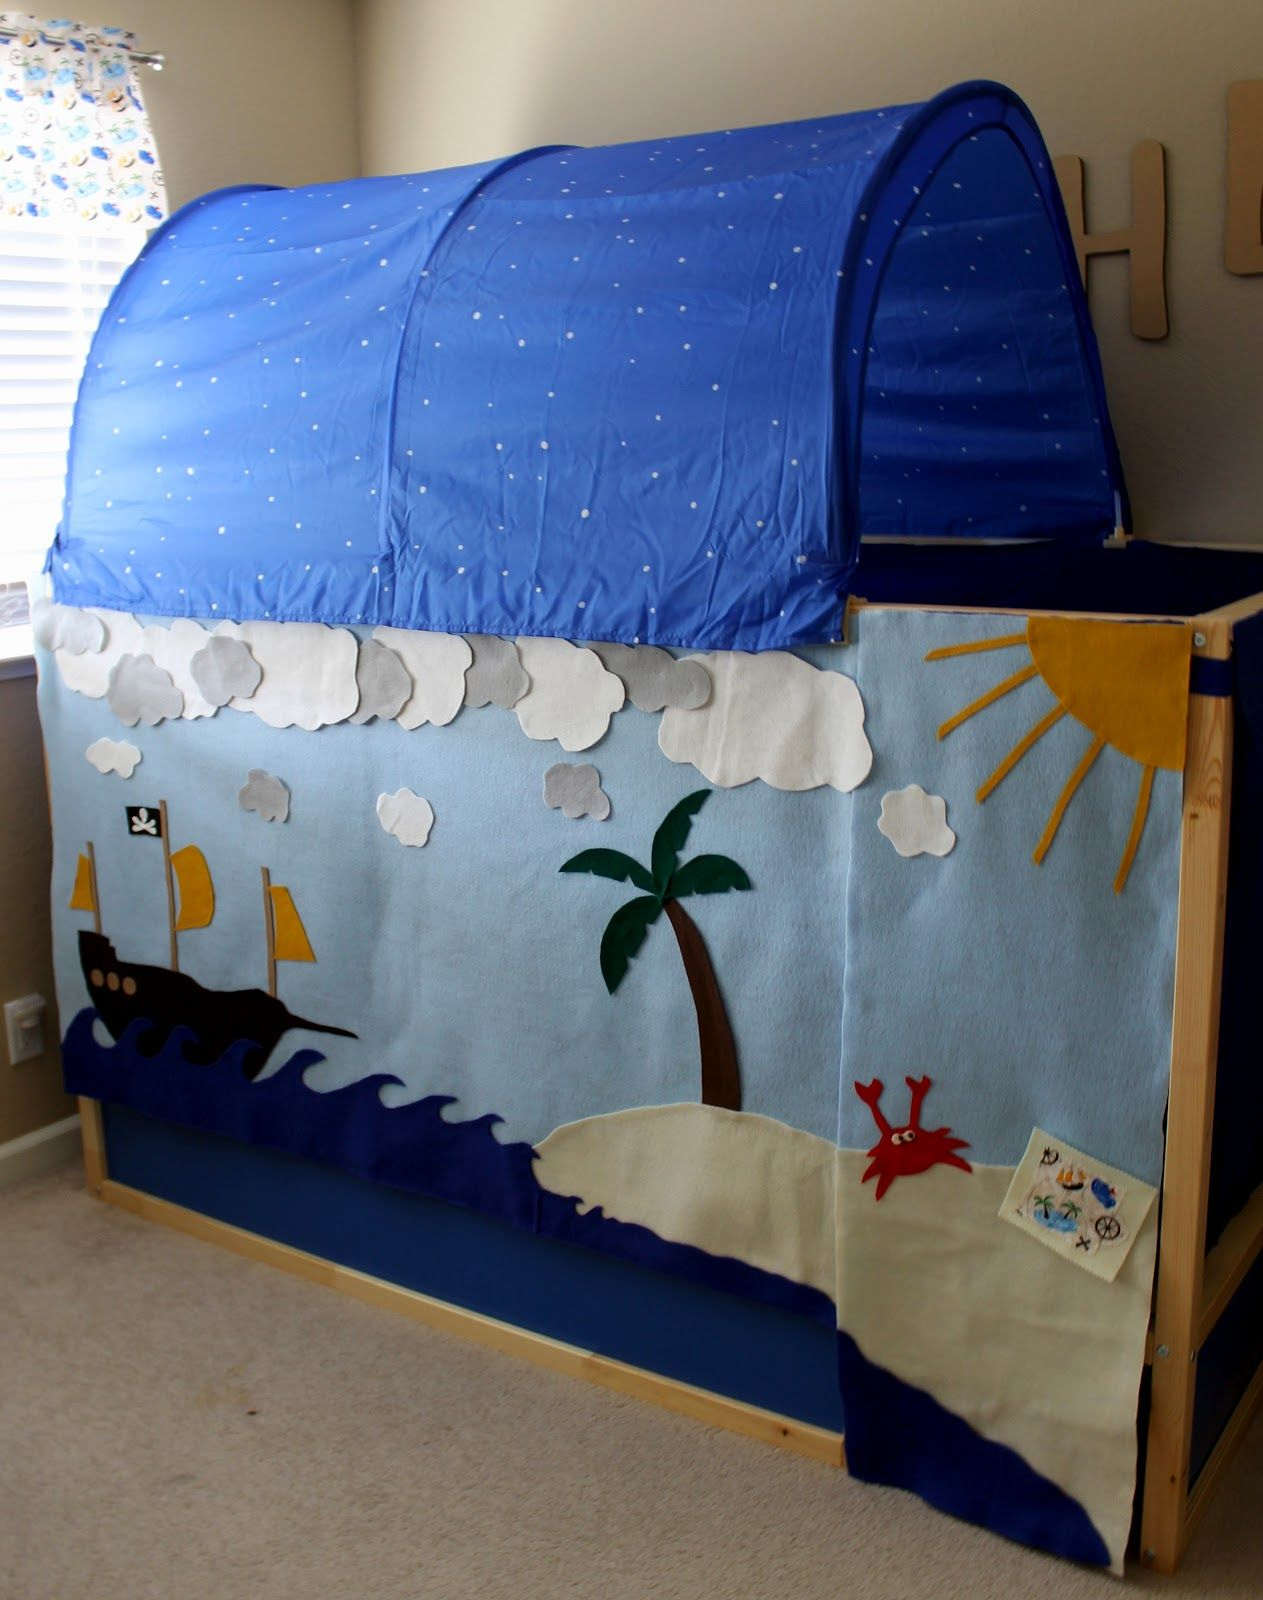 Mama\u0027s Felt Cafe: Felt Pirate Fort Ikea Kura Bed | G33k ...